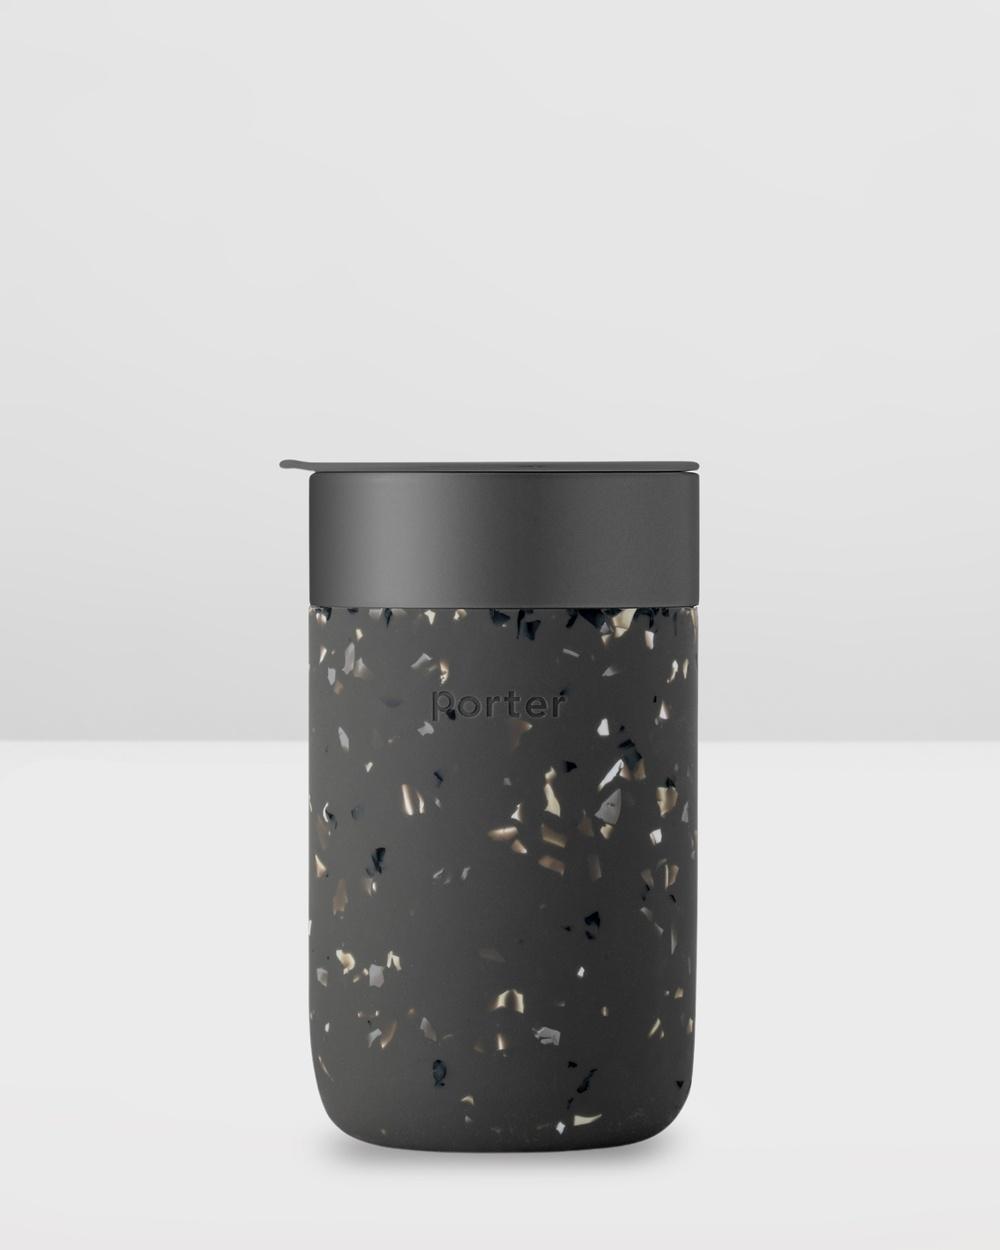 Porter Ceramic Mug Terrazzo 480ml Home Black